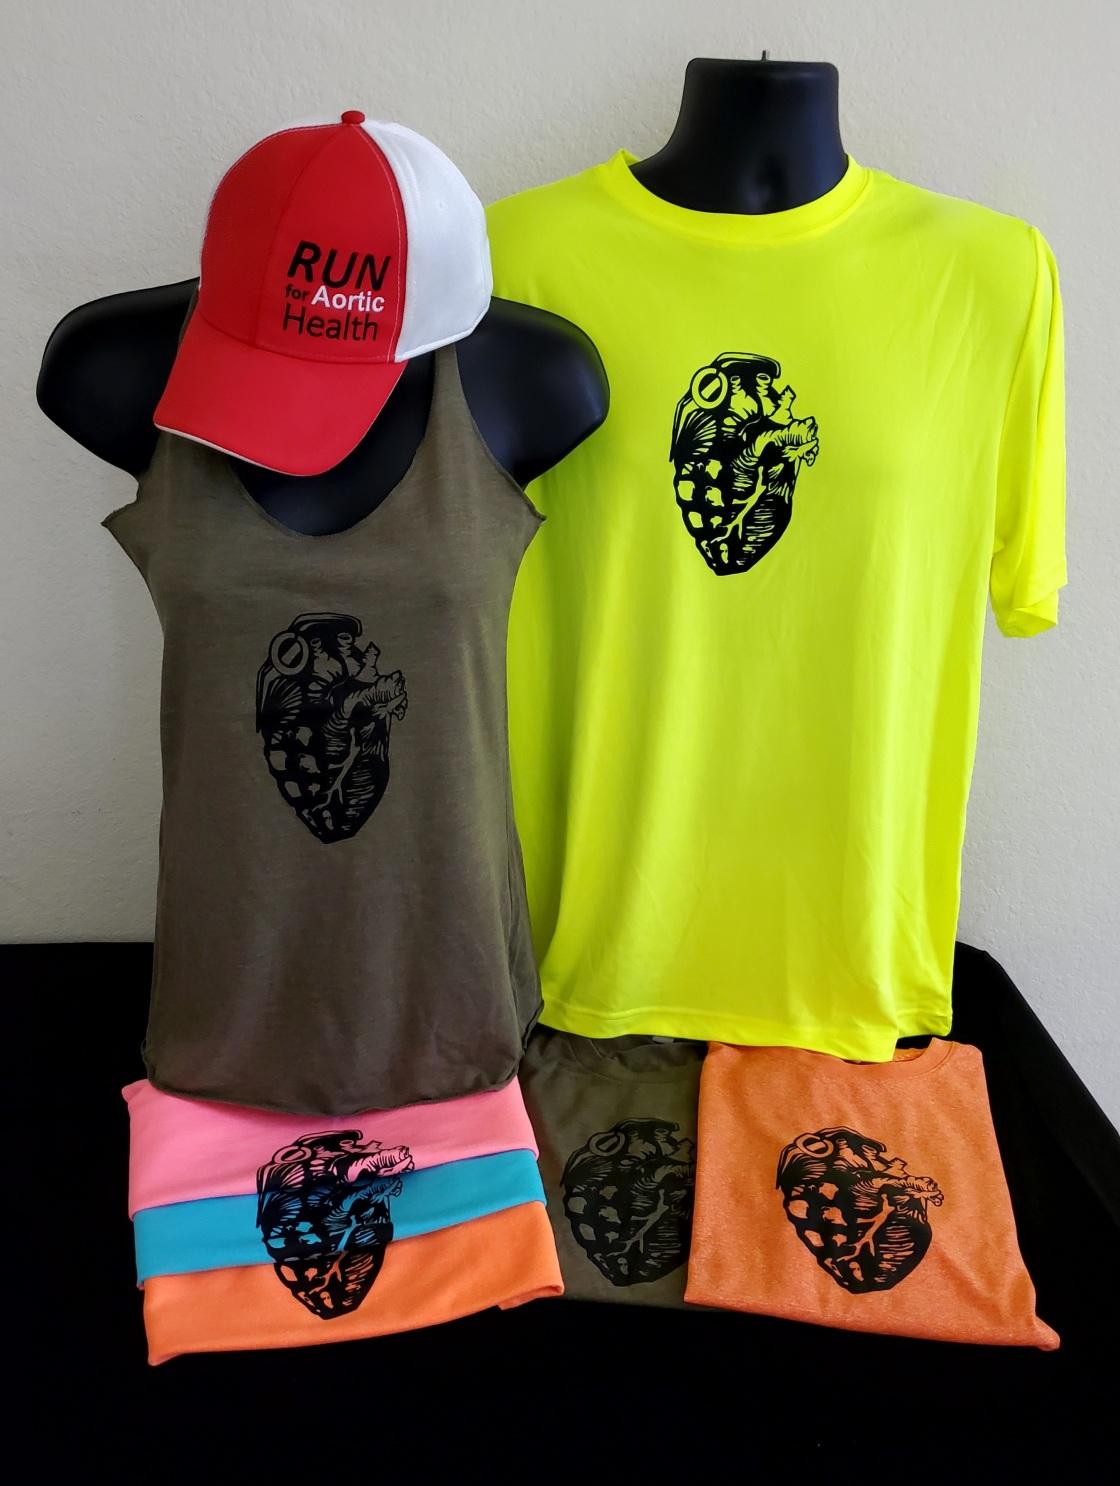 all shirts sample pic